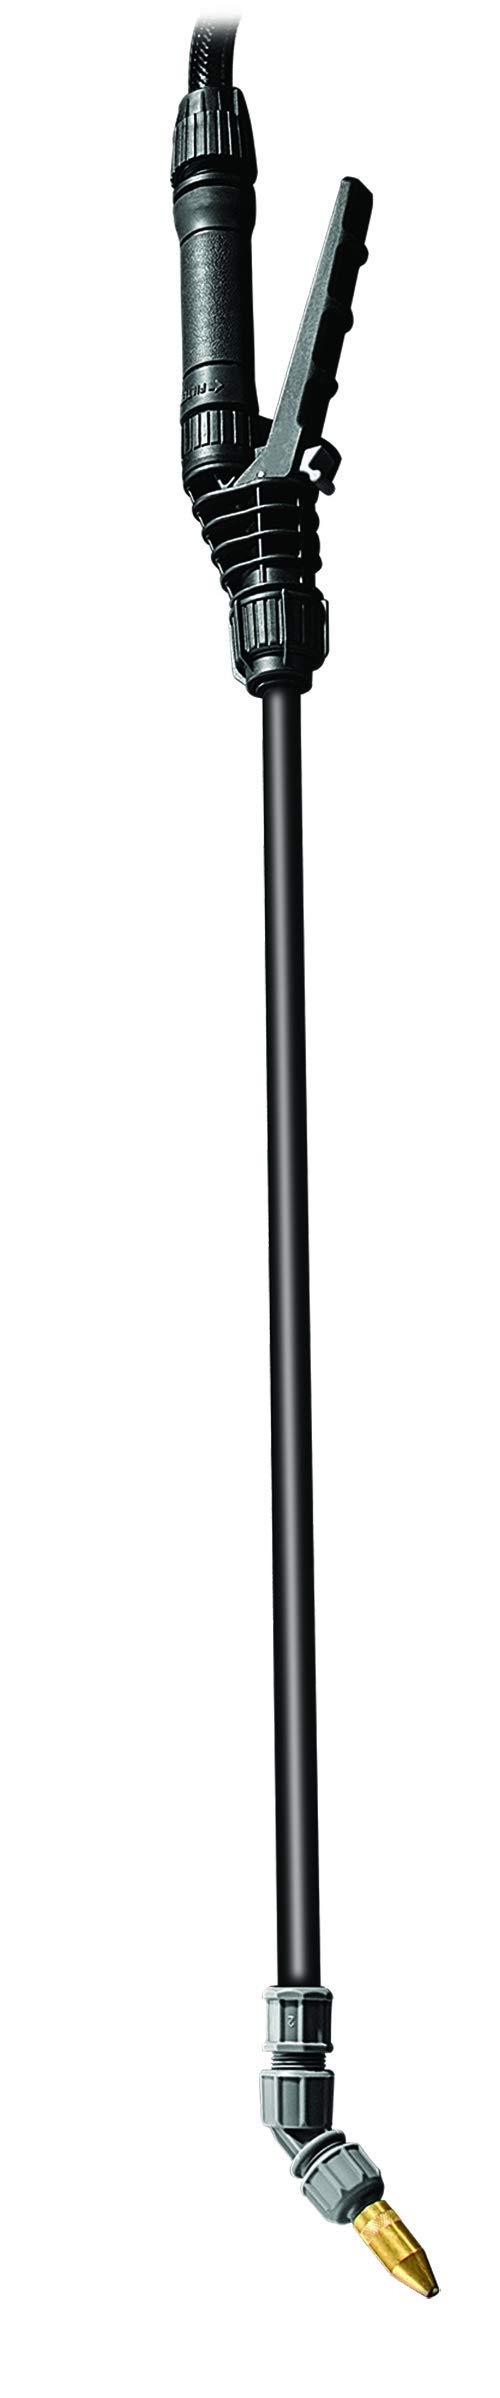 10-40 psi Black Stainless Steel 1.00-2.00 GPM TeeJet TF-VS10 Turbo Floodjet Spray Tip